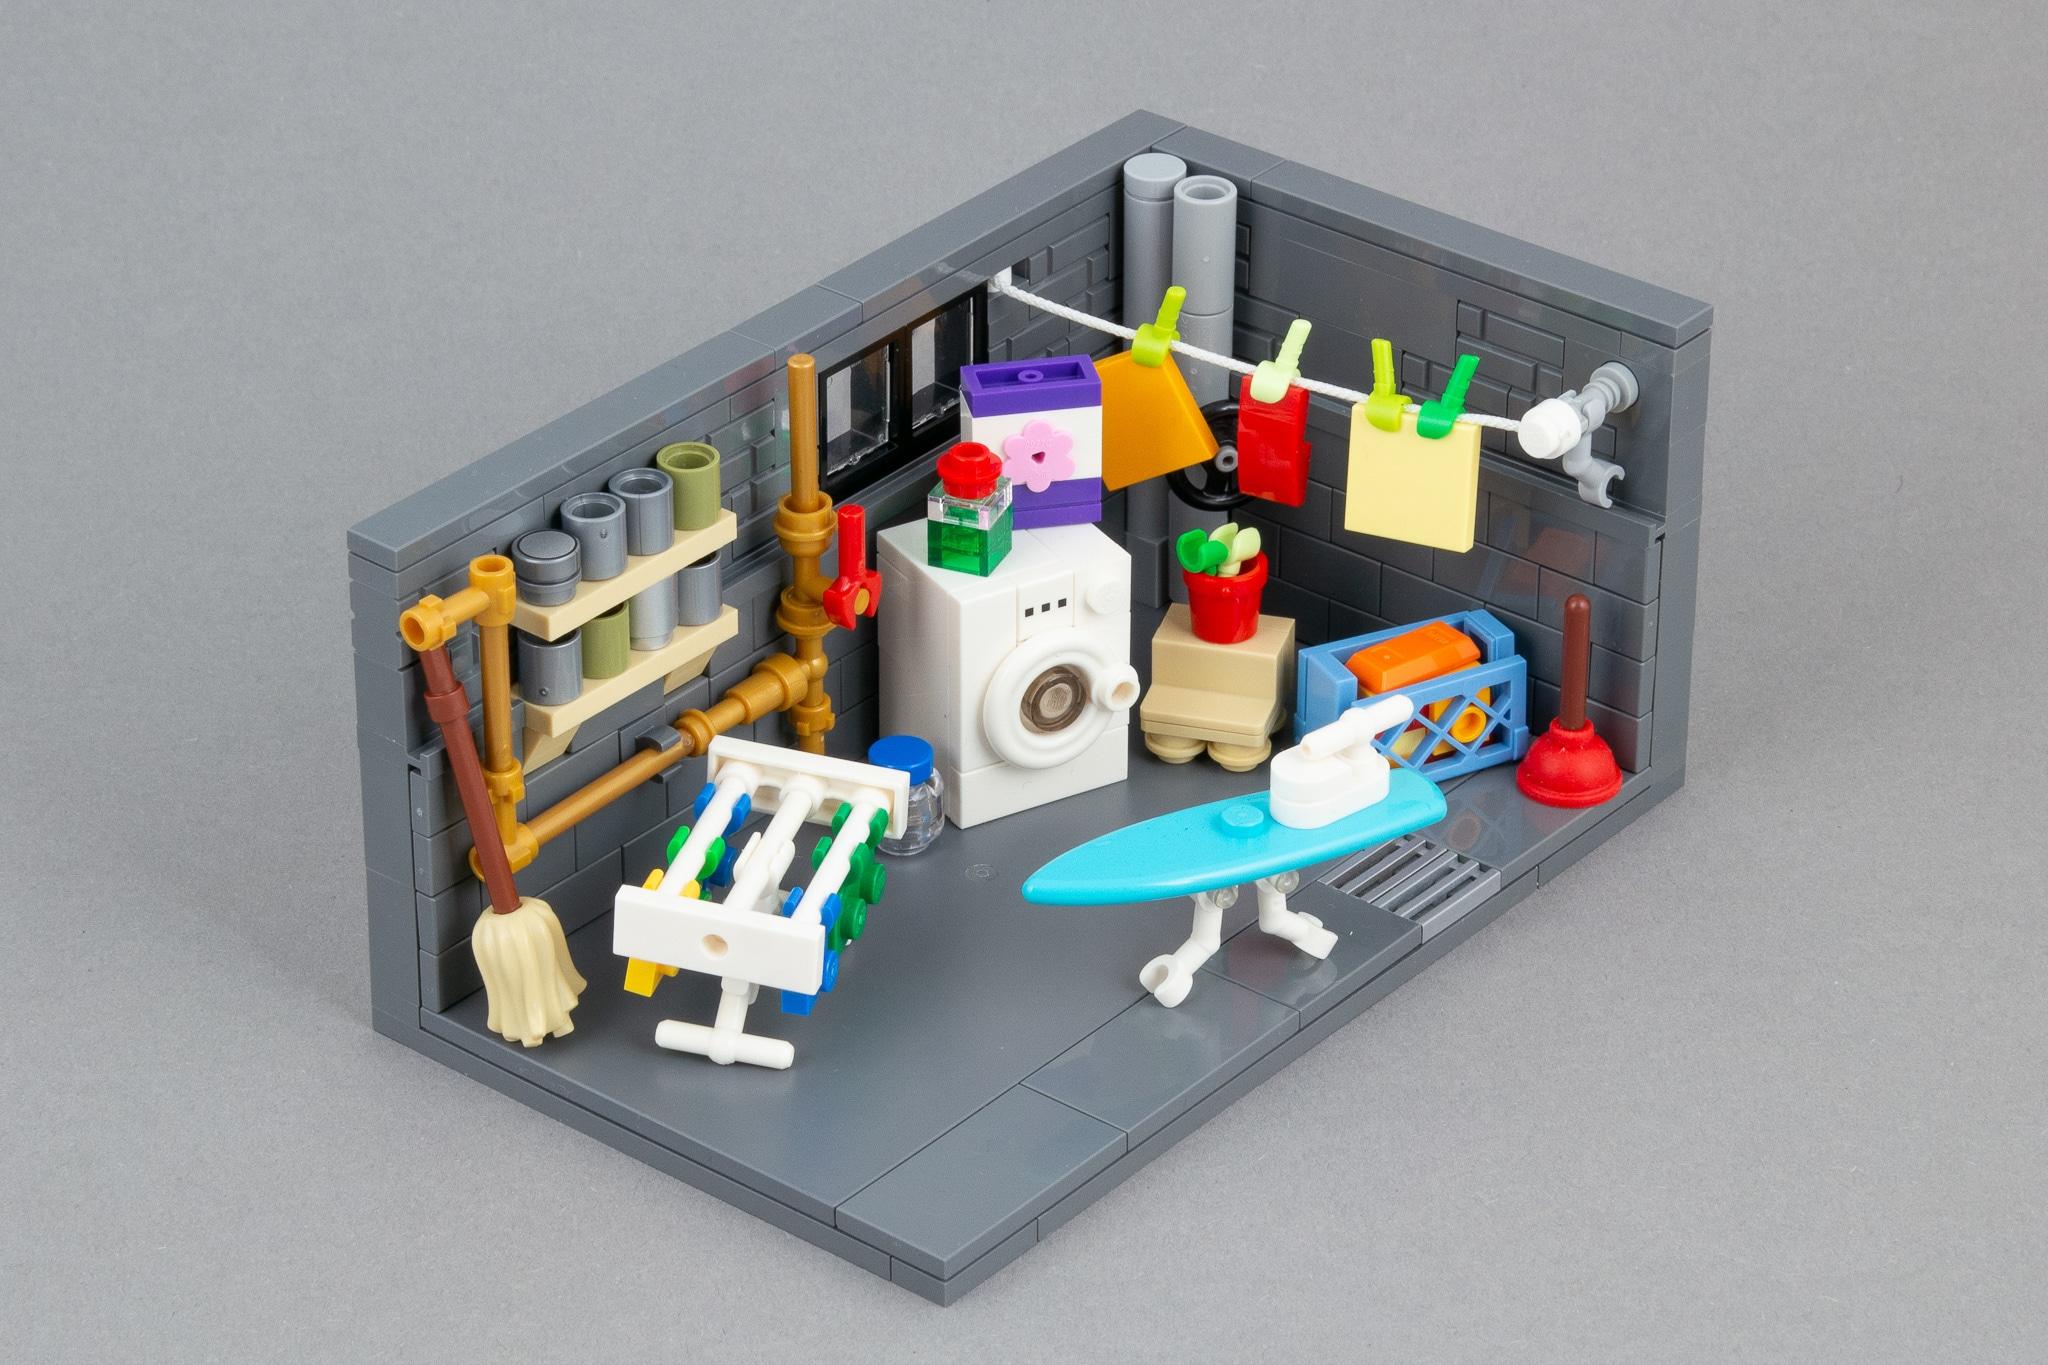 LEGO Moc Waschkeller (4)